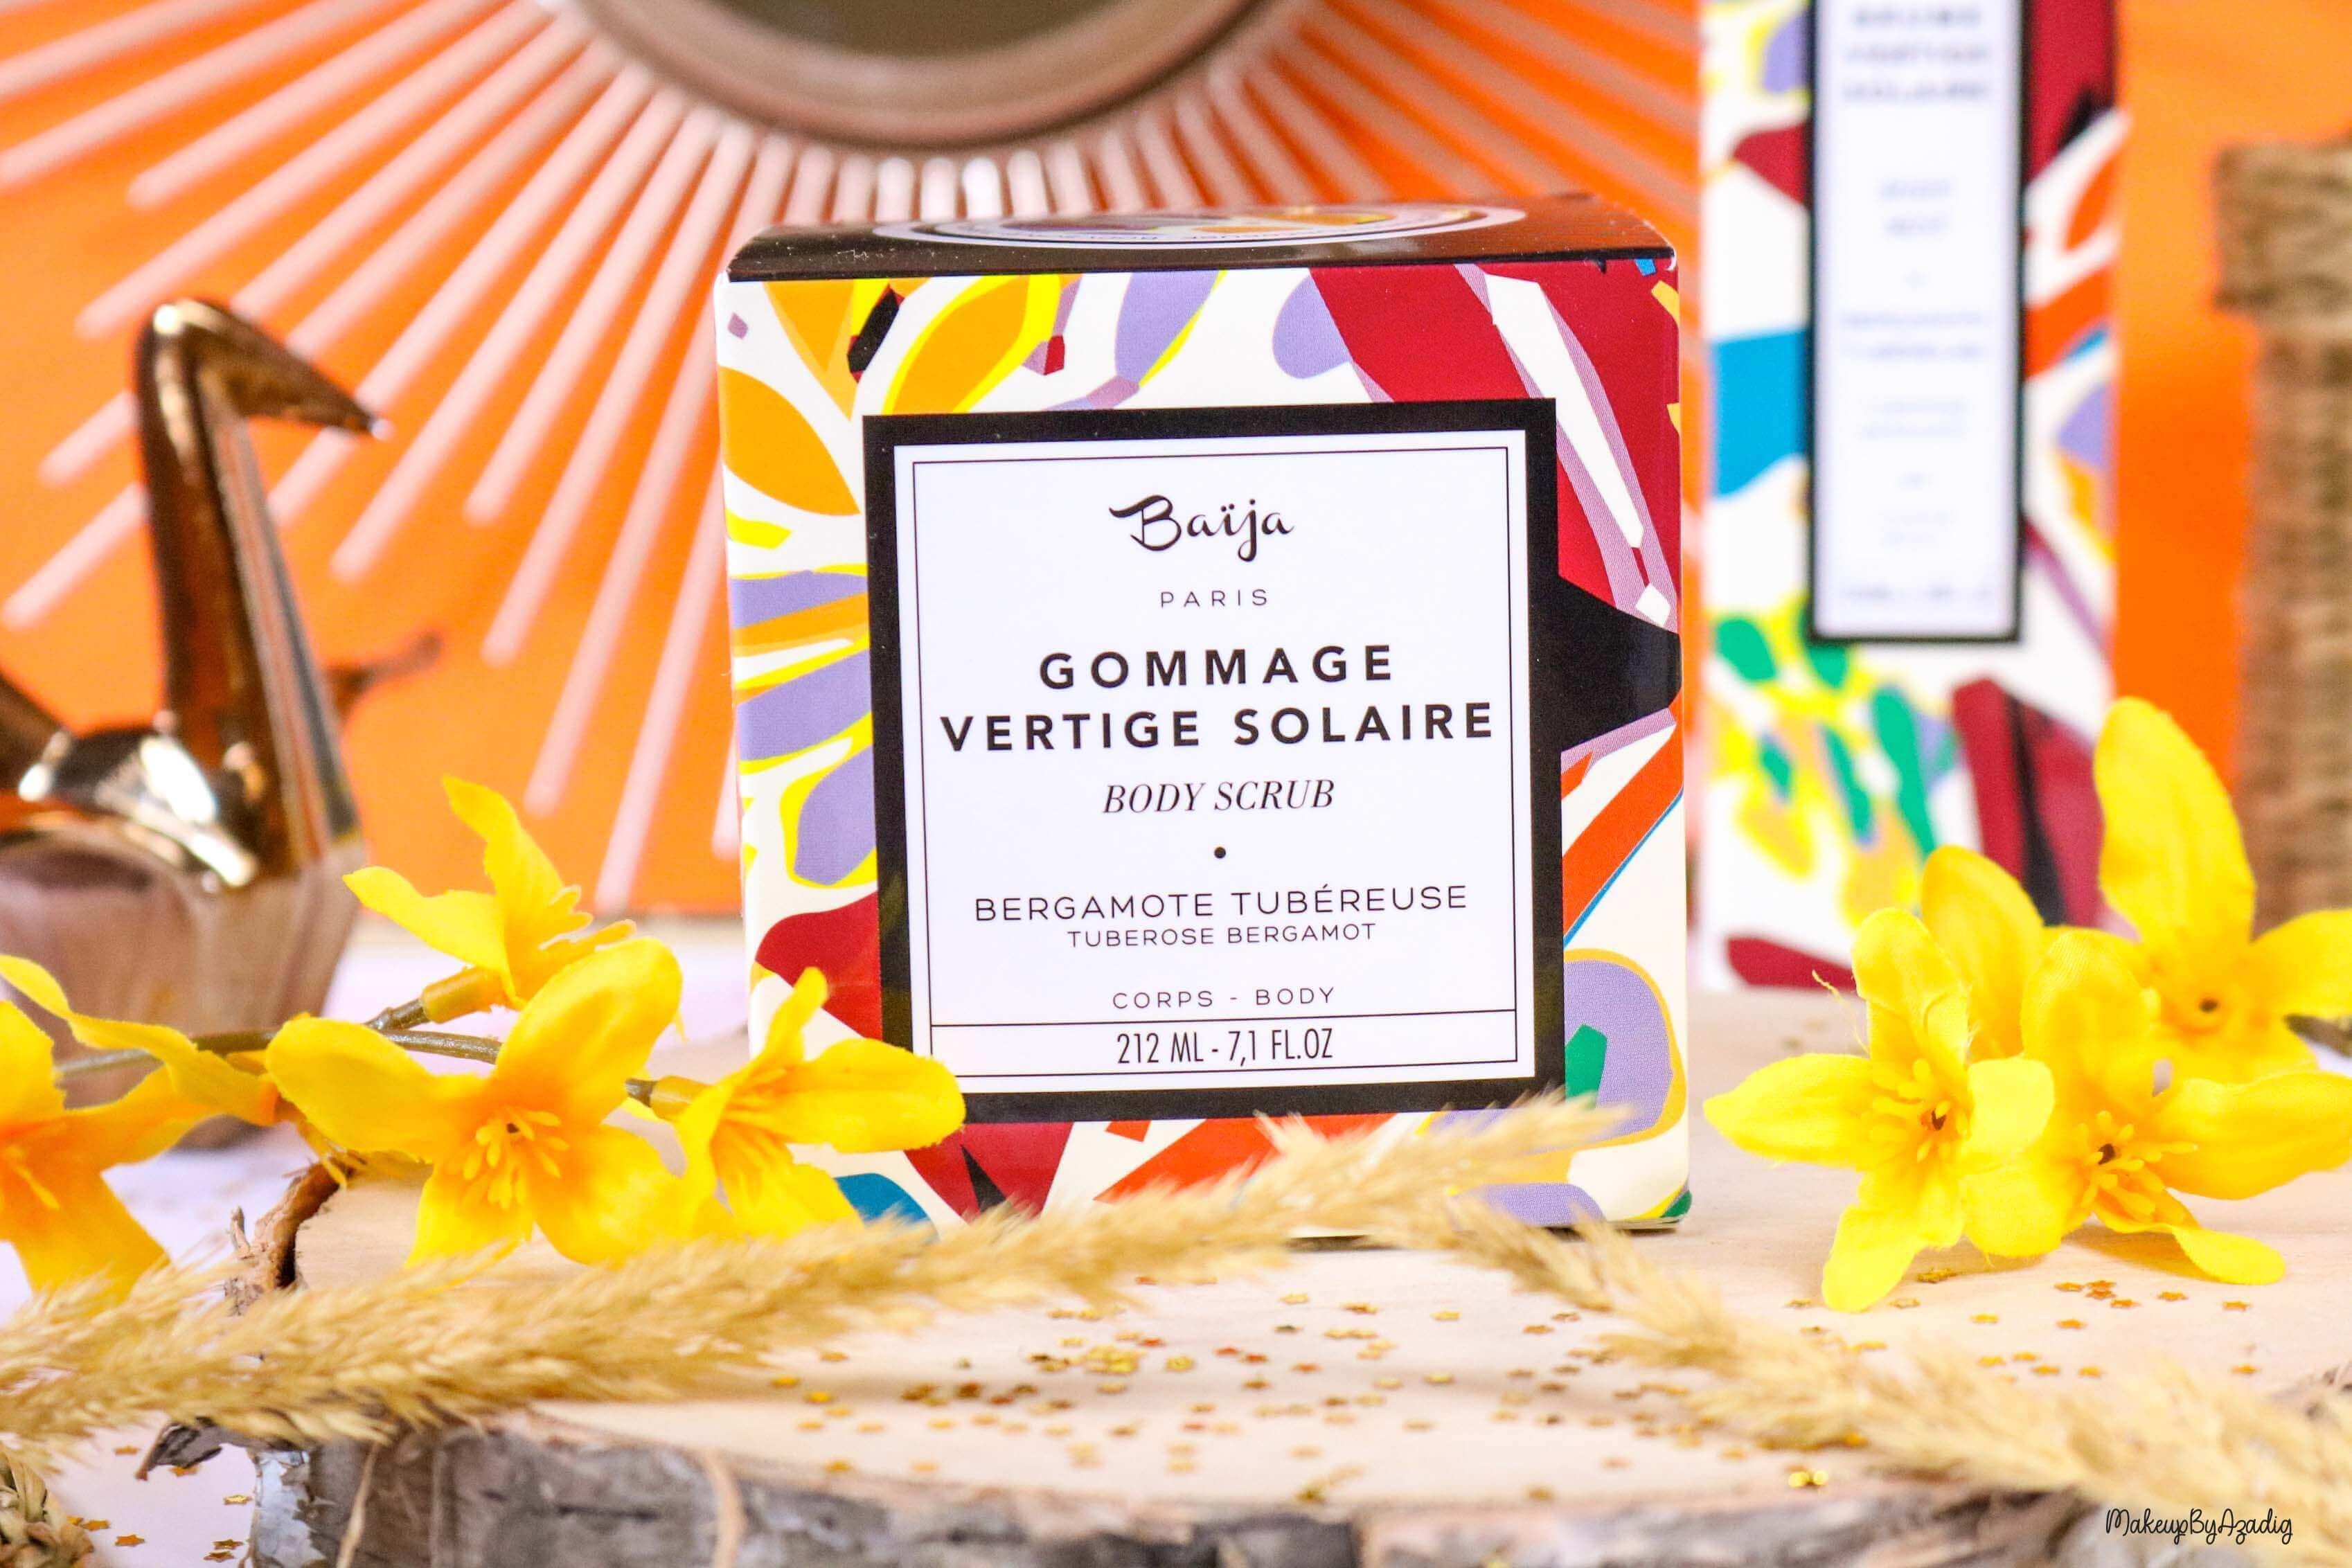 nouveaute-soin-baija-vertige-solaire-sephora-promo-code-gommage-creme-corps-brume-avis-prix-qualite-makeupbyazadig-sucre